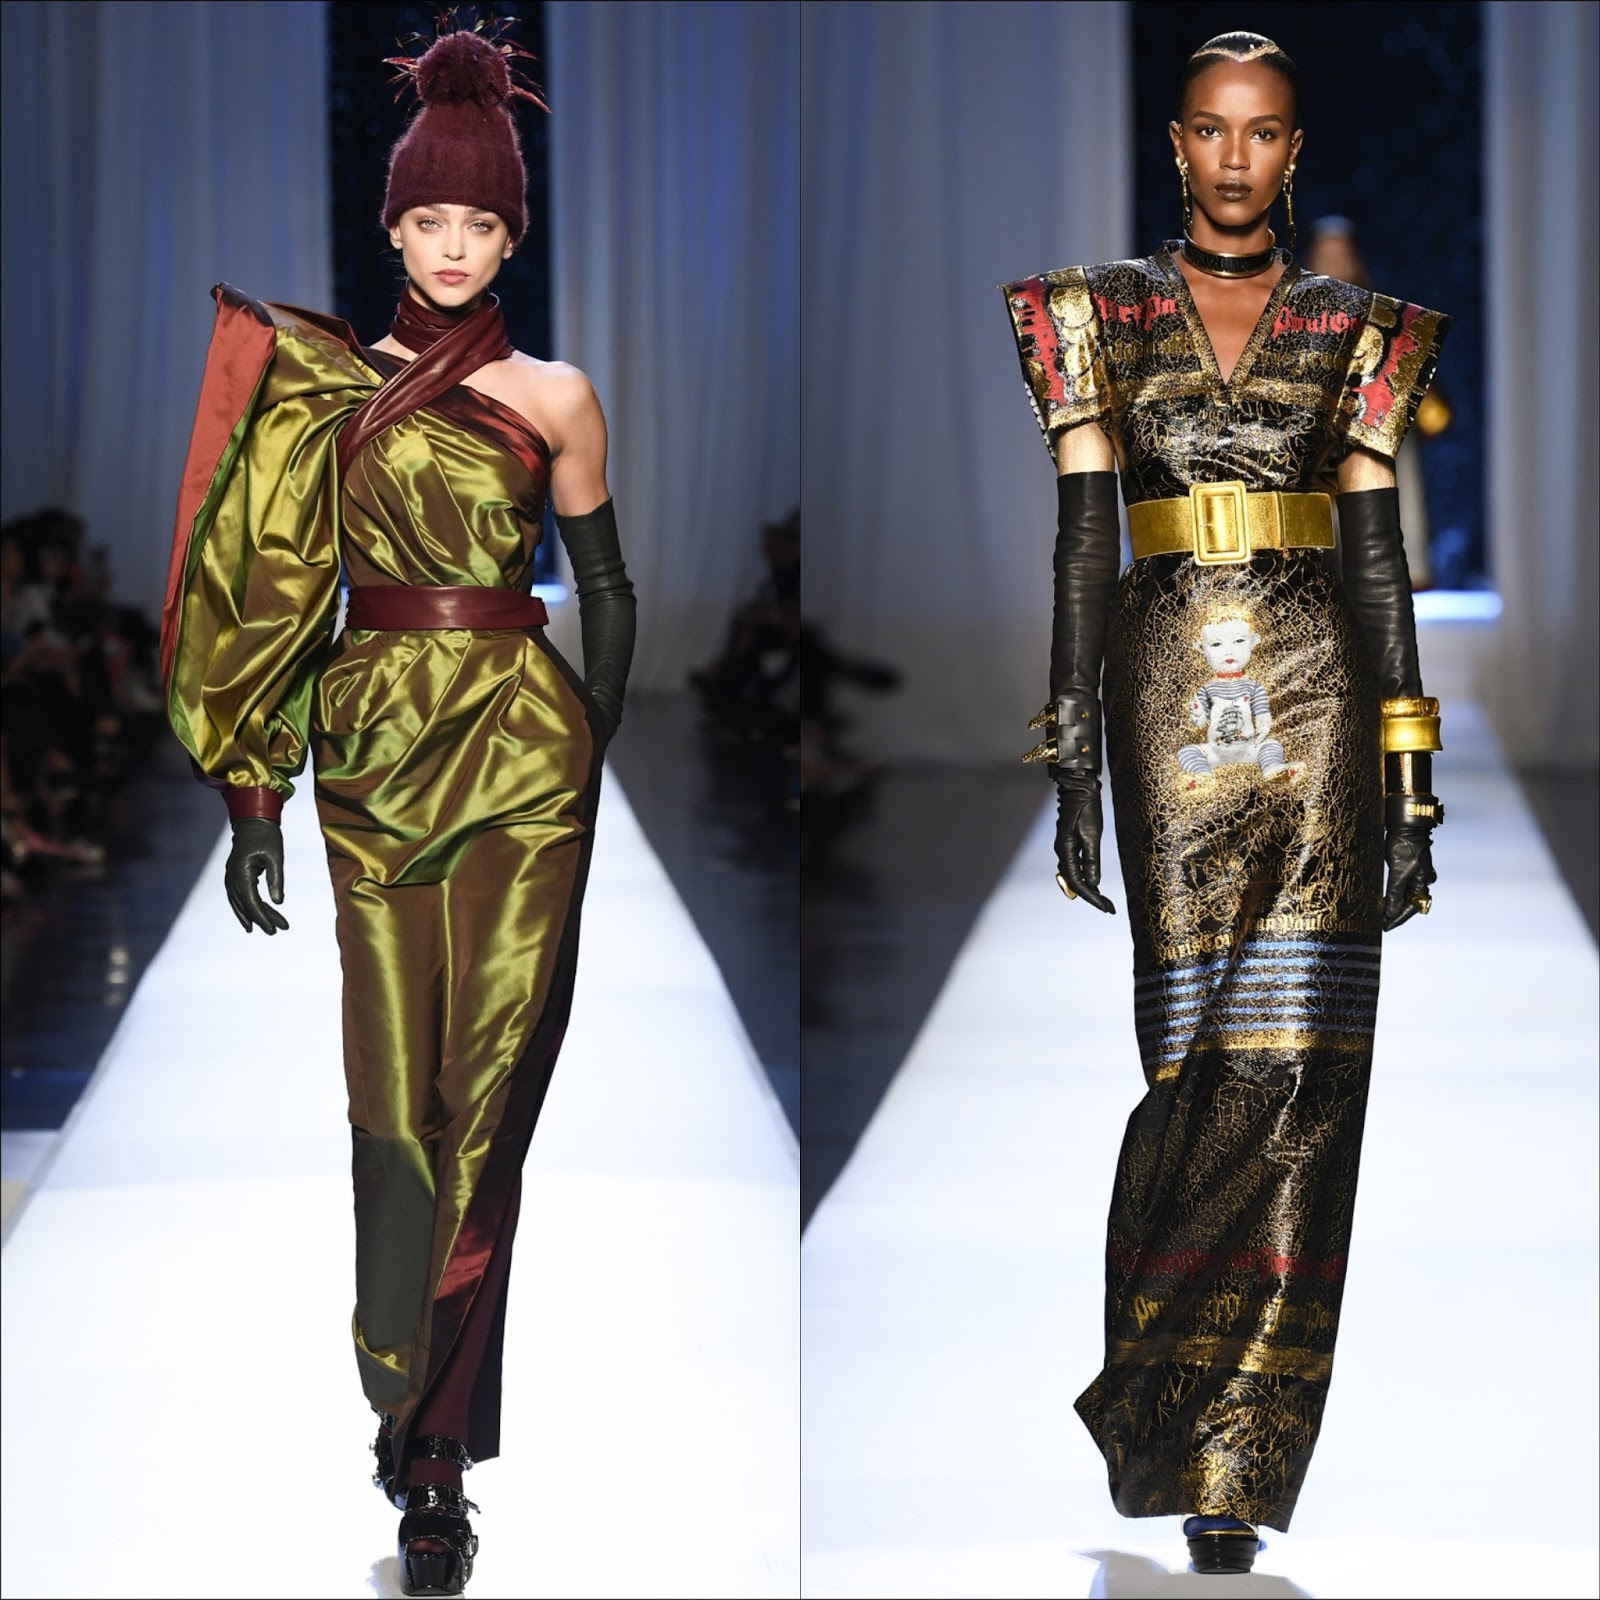 Jean Paul Gaultier Haute Couture Fall Winter 2017